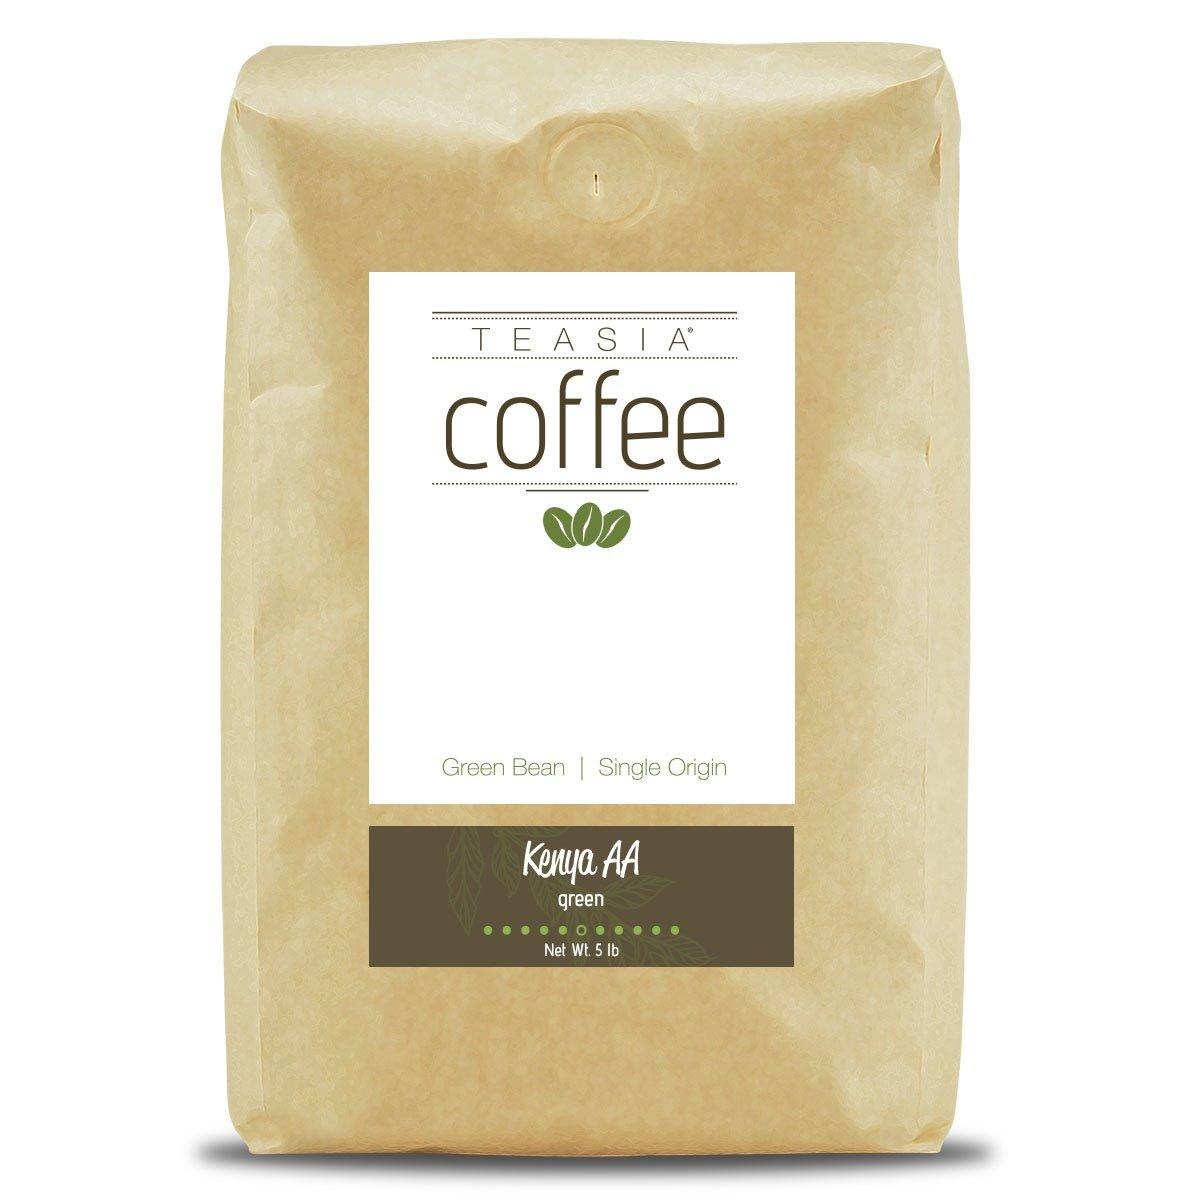 Teasia Coffee, Kenya AA, Single Origin, Green Unroasted Whole Coffee Beans, 5-Pound Bag